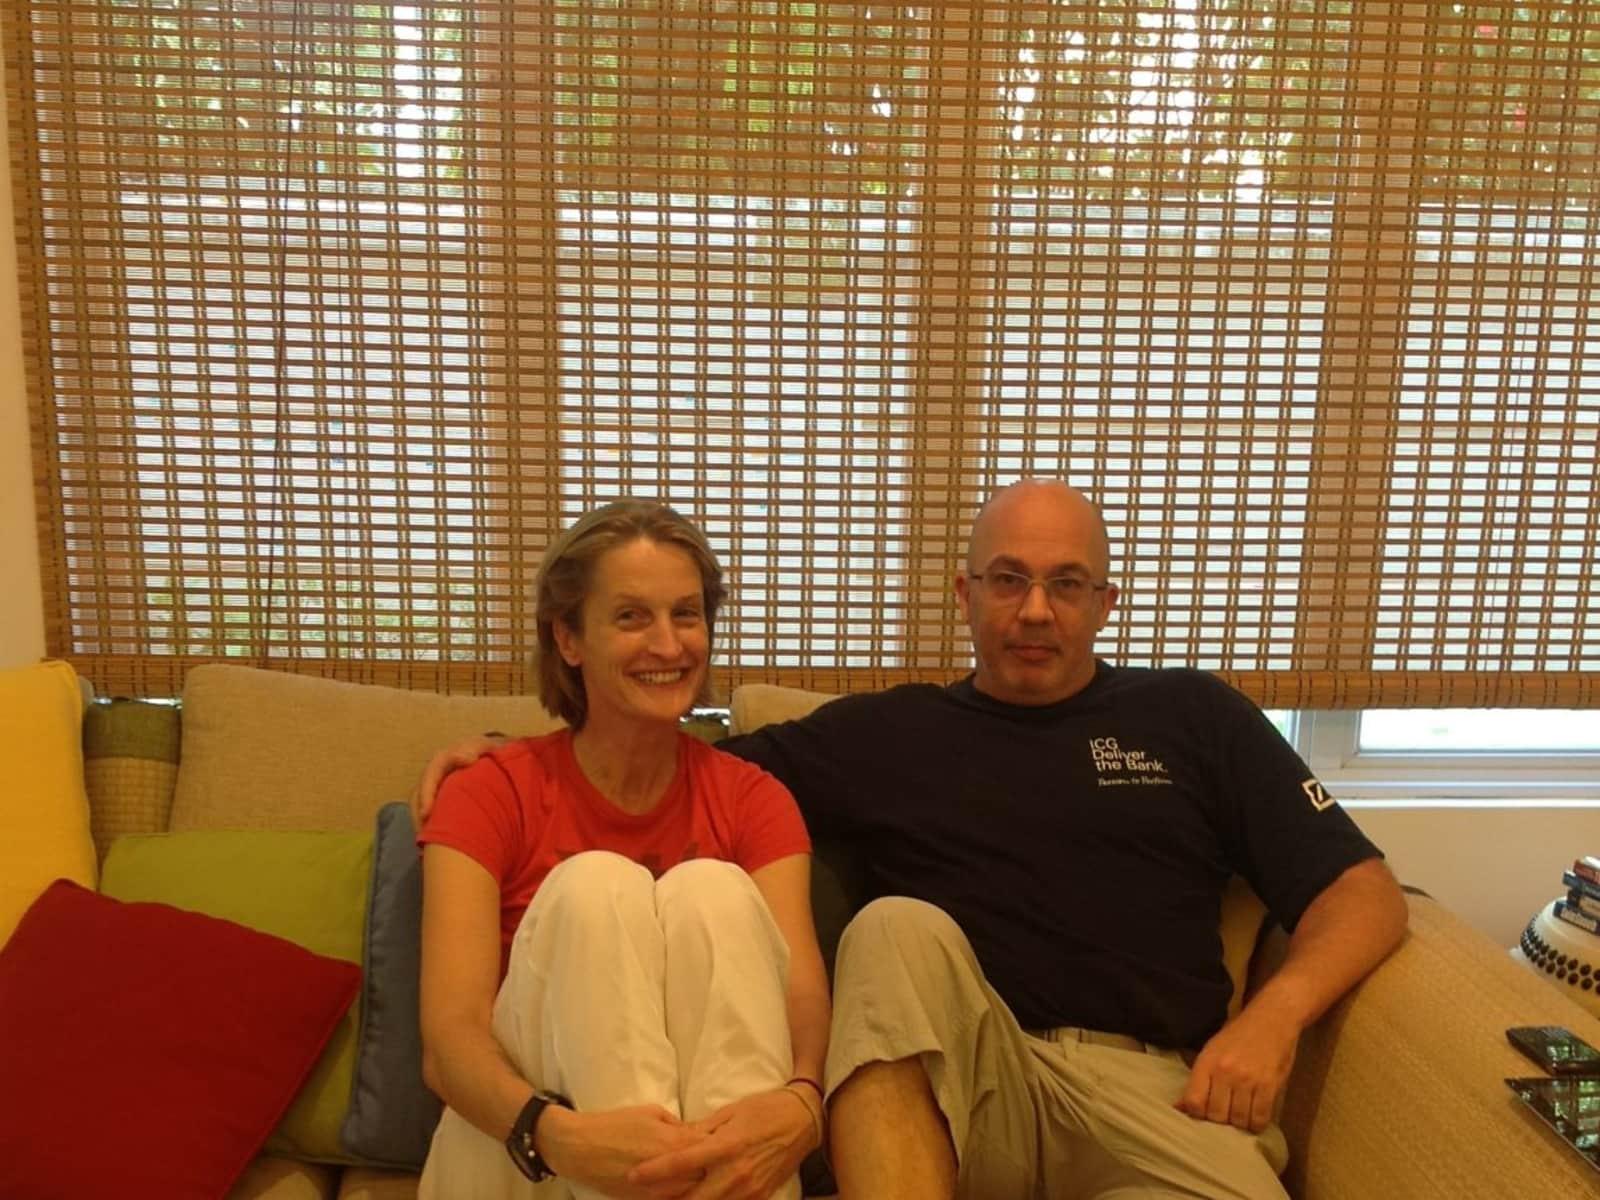 Tim & Anna from Chesières, Switzerland